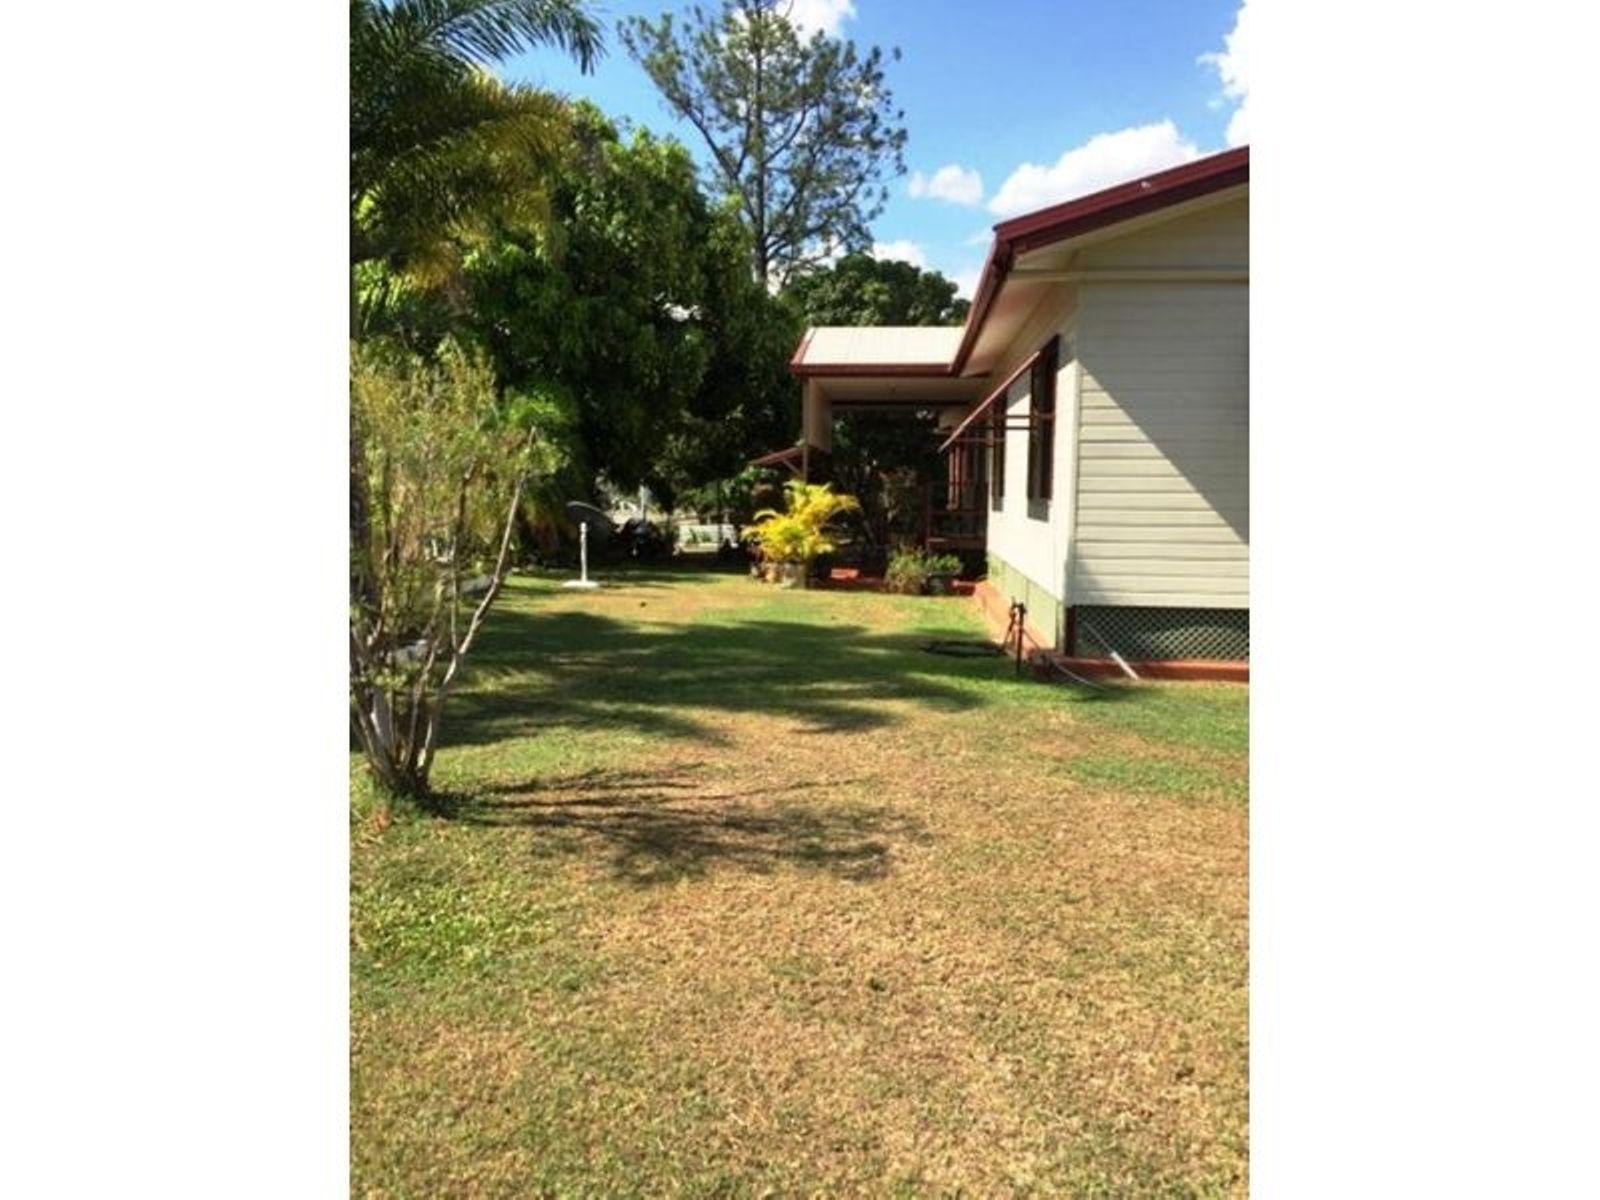 1 MONAZITE Street, Mount Garnet, QLD 4872